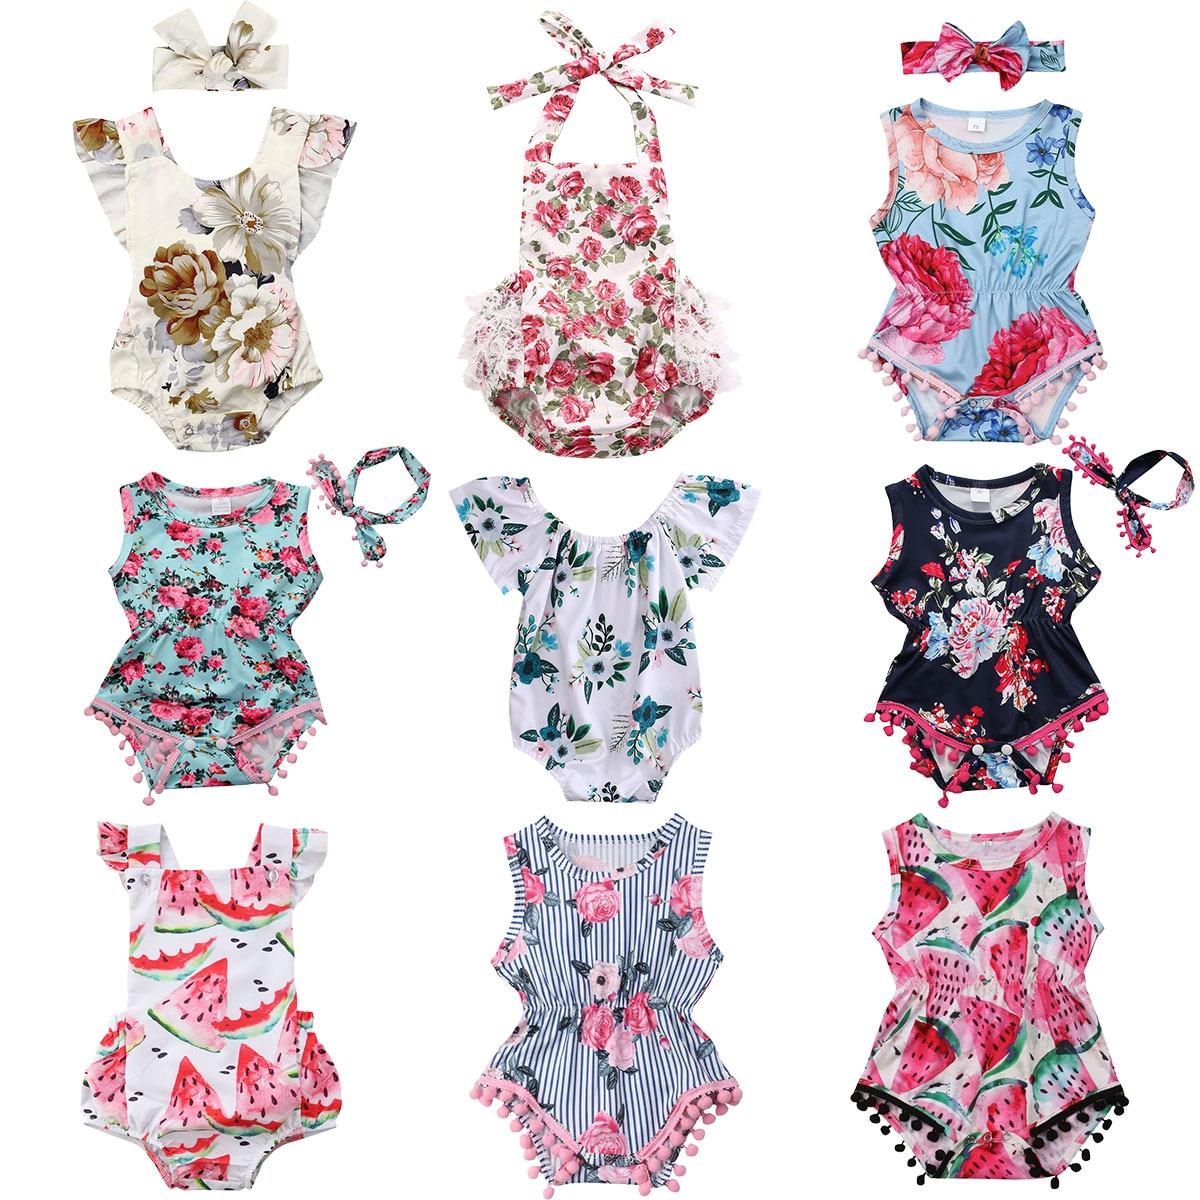 Newborn Toddler Girls 2Pc Tassel Outfits Coconut Print Short Sleeve Floral T-Shirt Tops Elastic Waist Shorts Summer Clothes